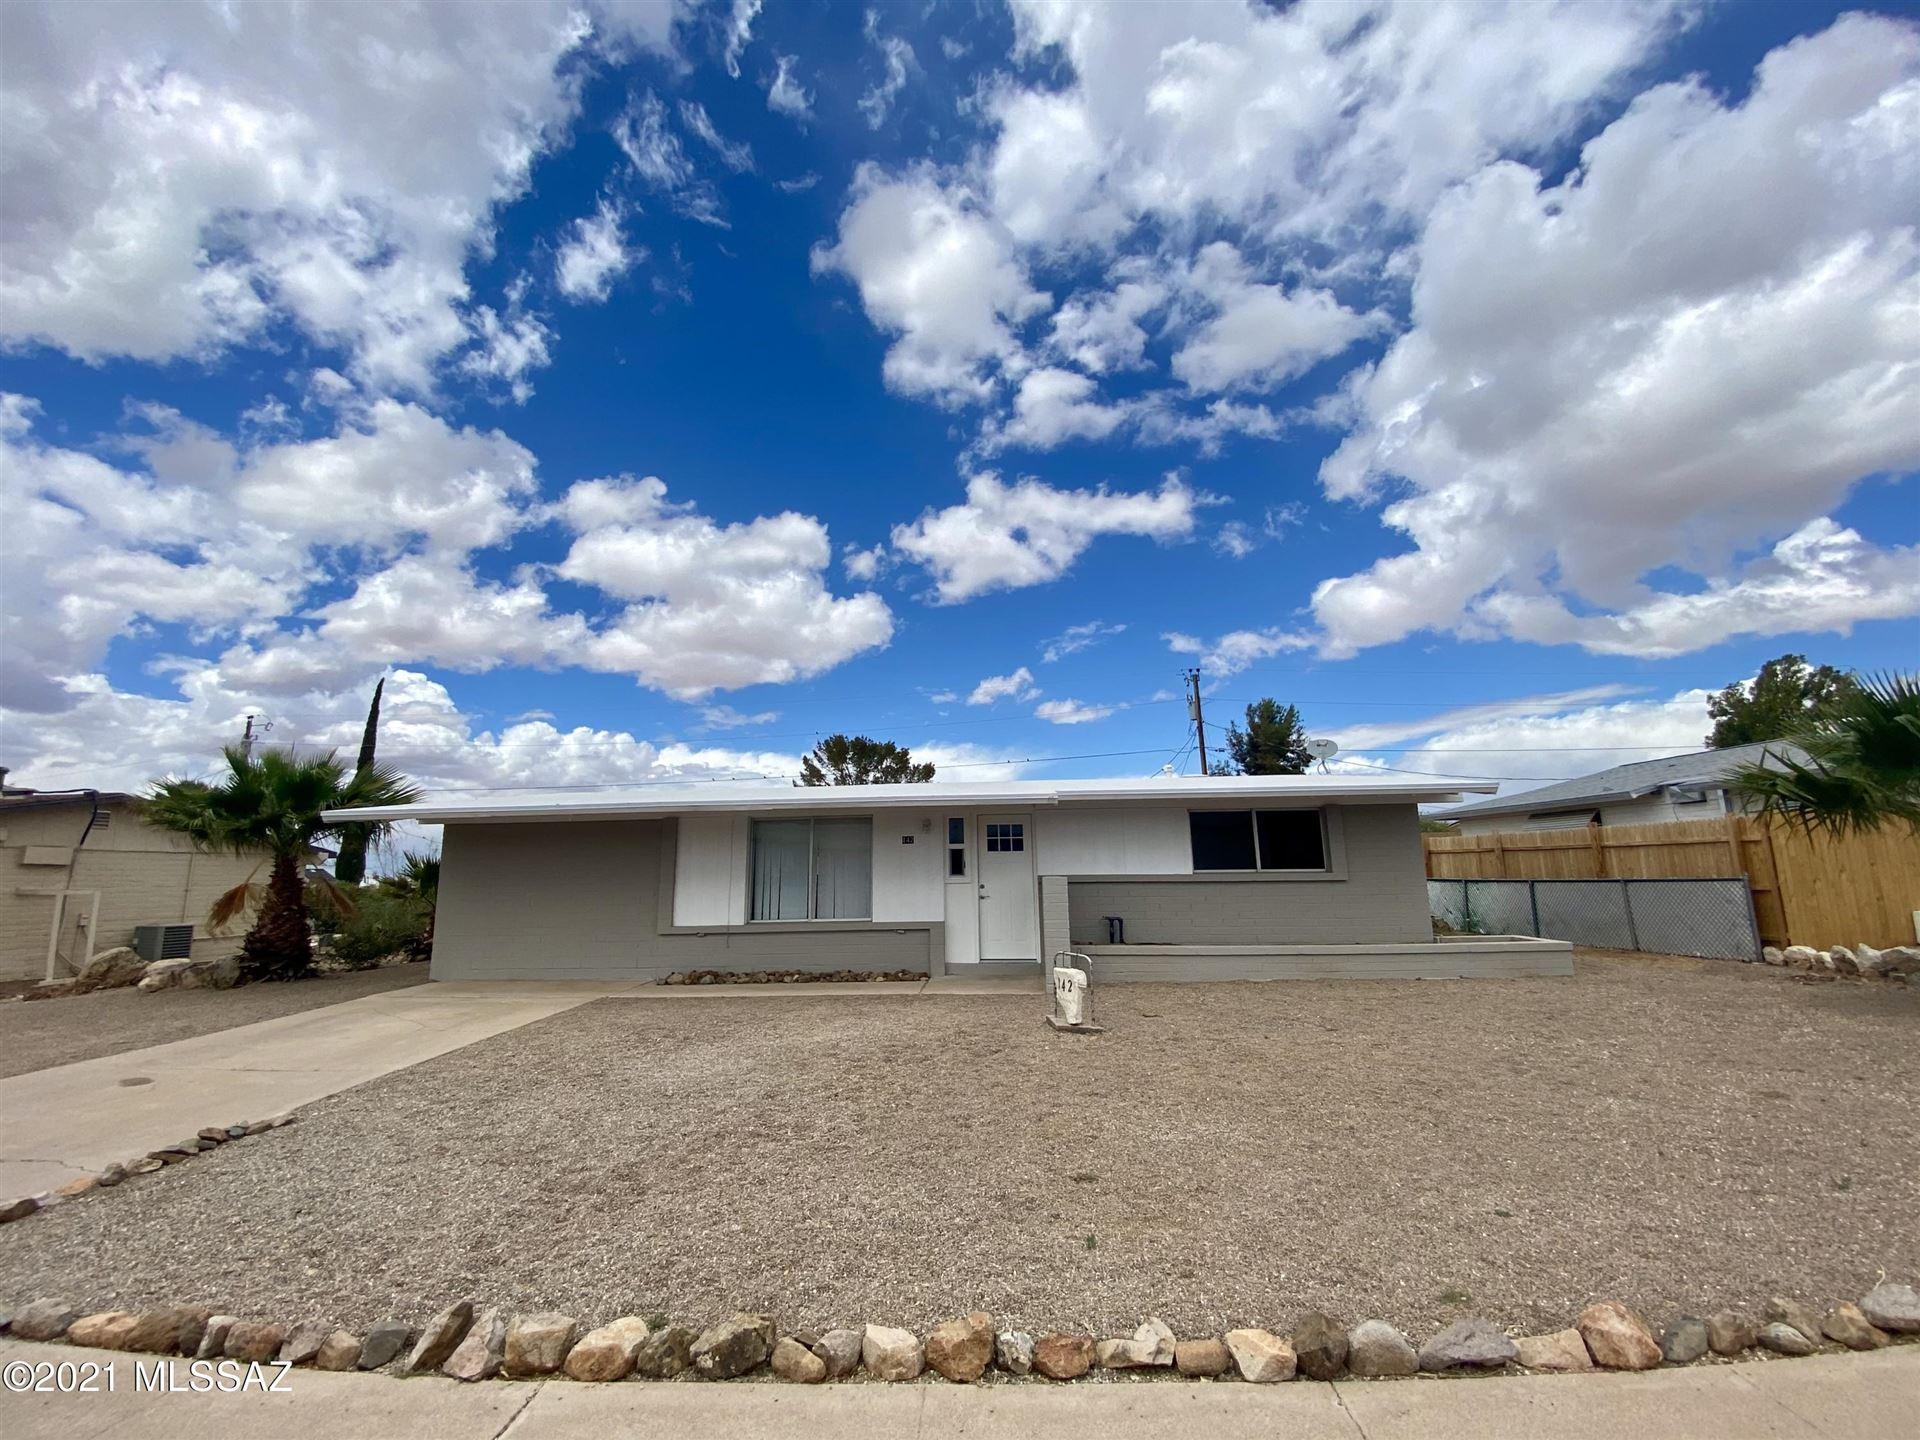 142 W Cn Rock Street, Corona de Tucson, AZ 85641 - MLS#: 22111878